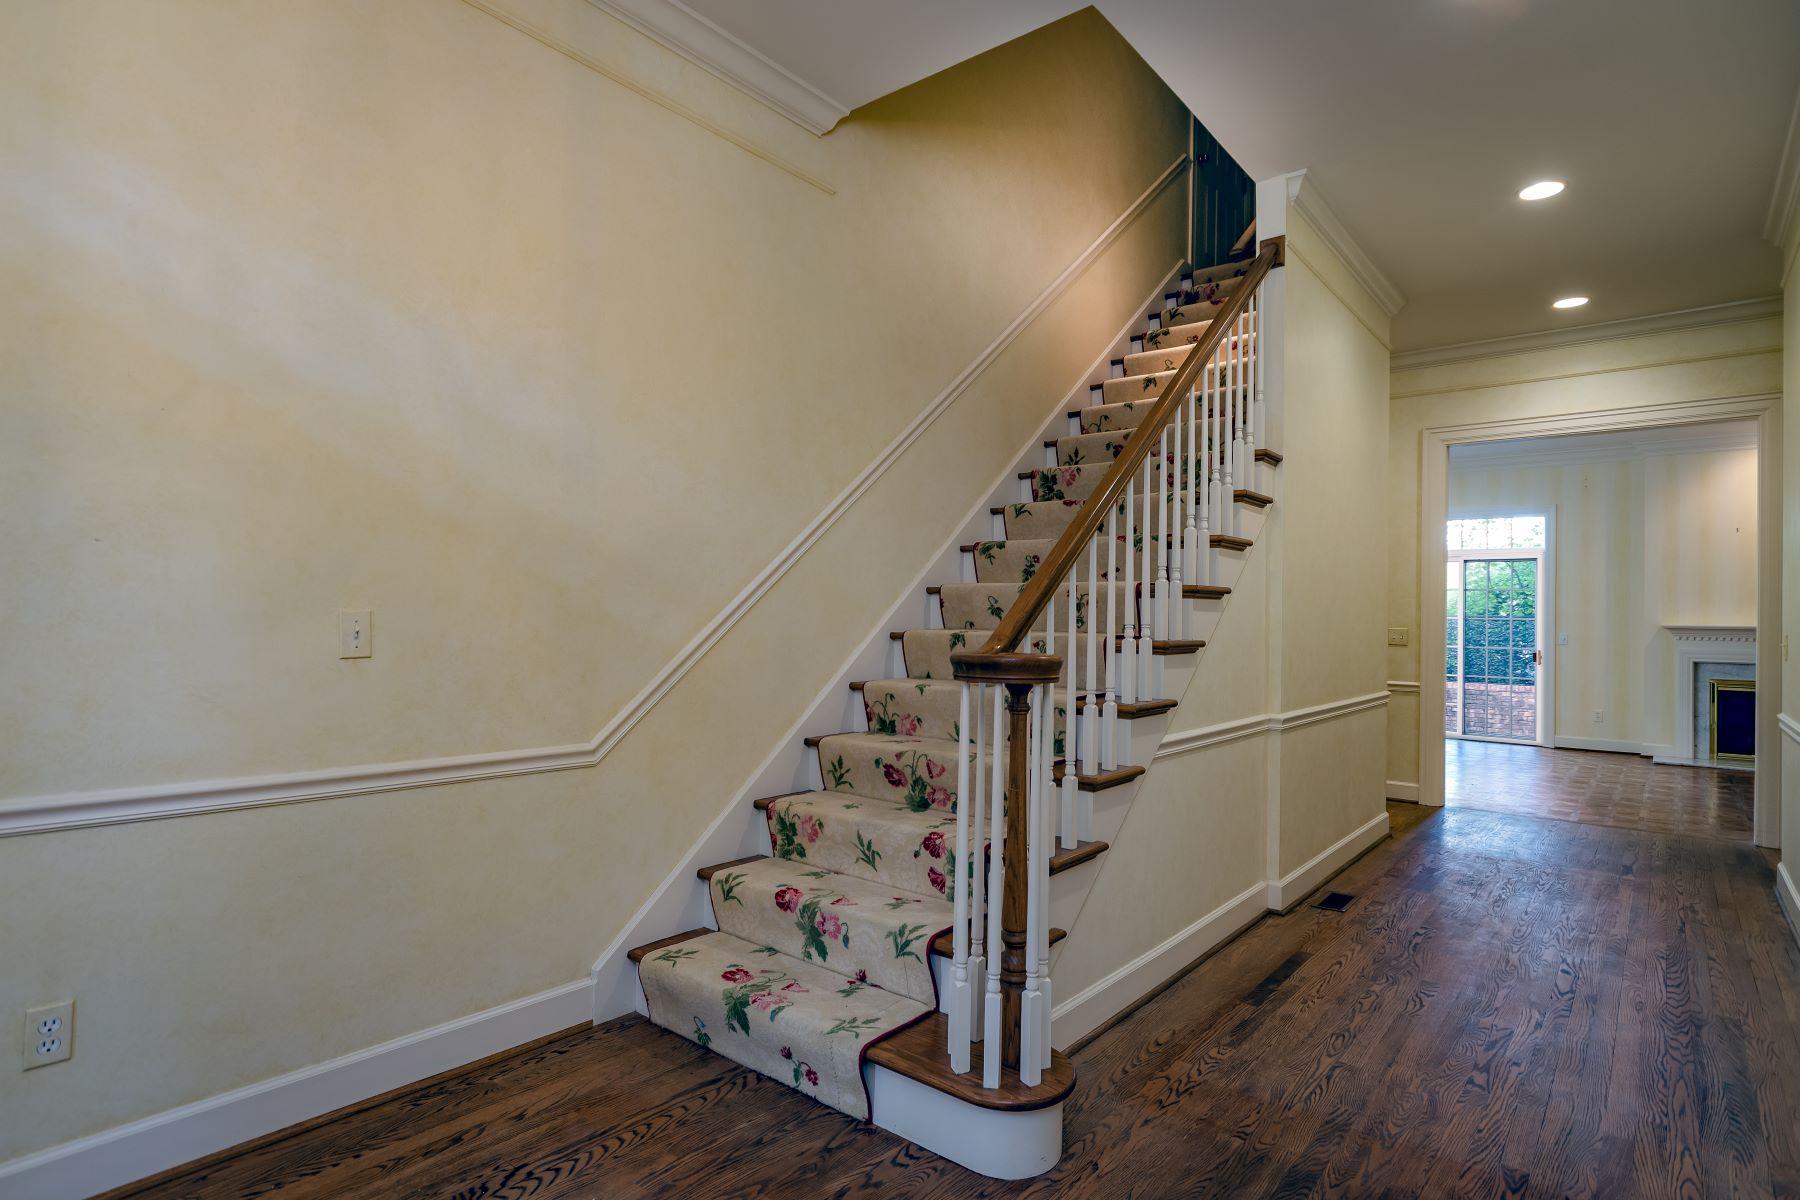 Additional photo for property listing at Sought After Villa in Olivette 5 Upper Price Road Olivette, Missouri 63132 United States